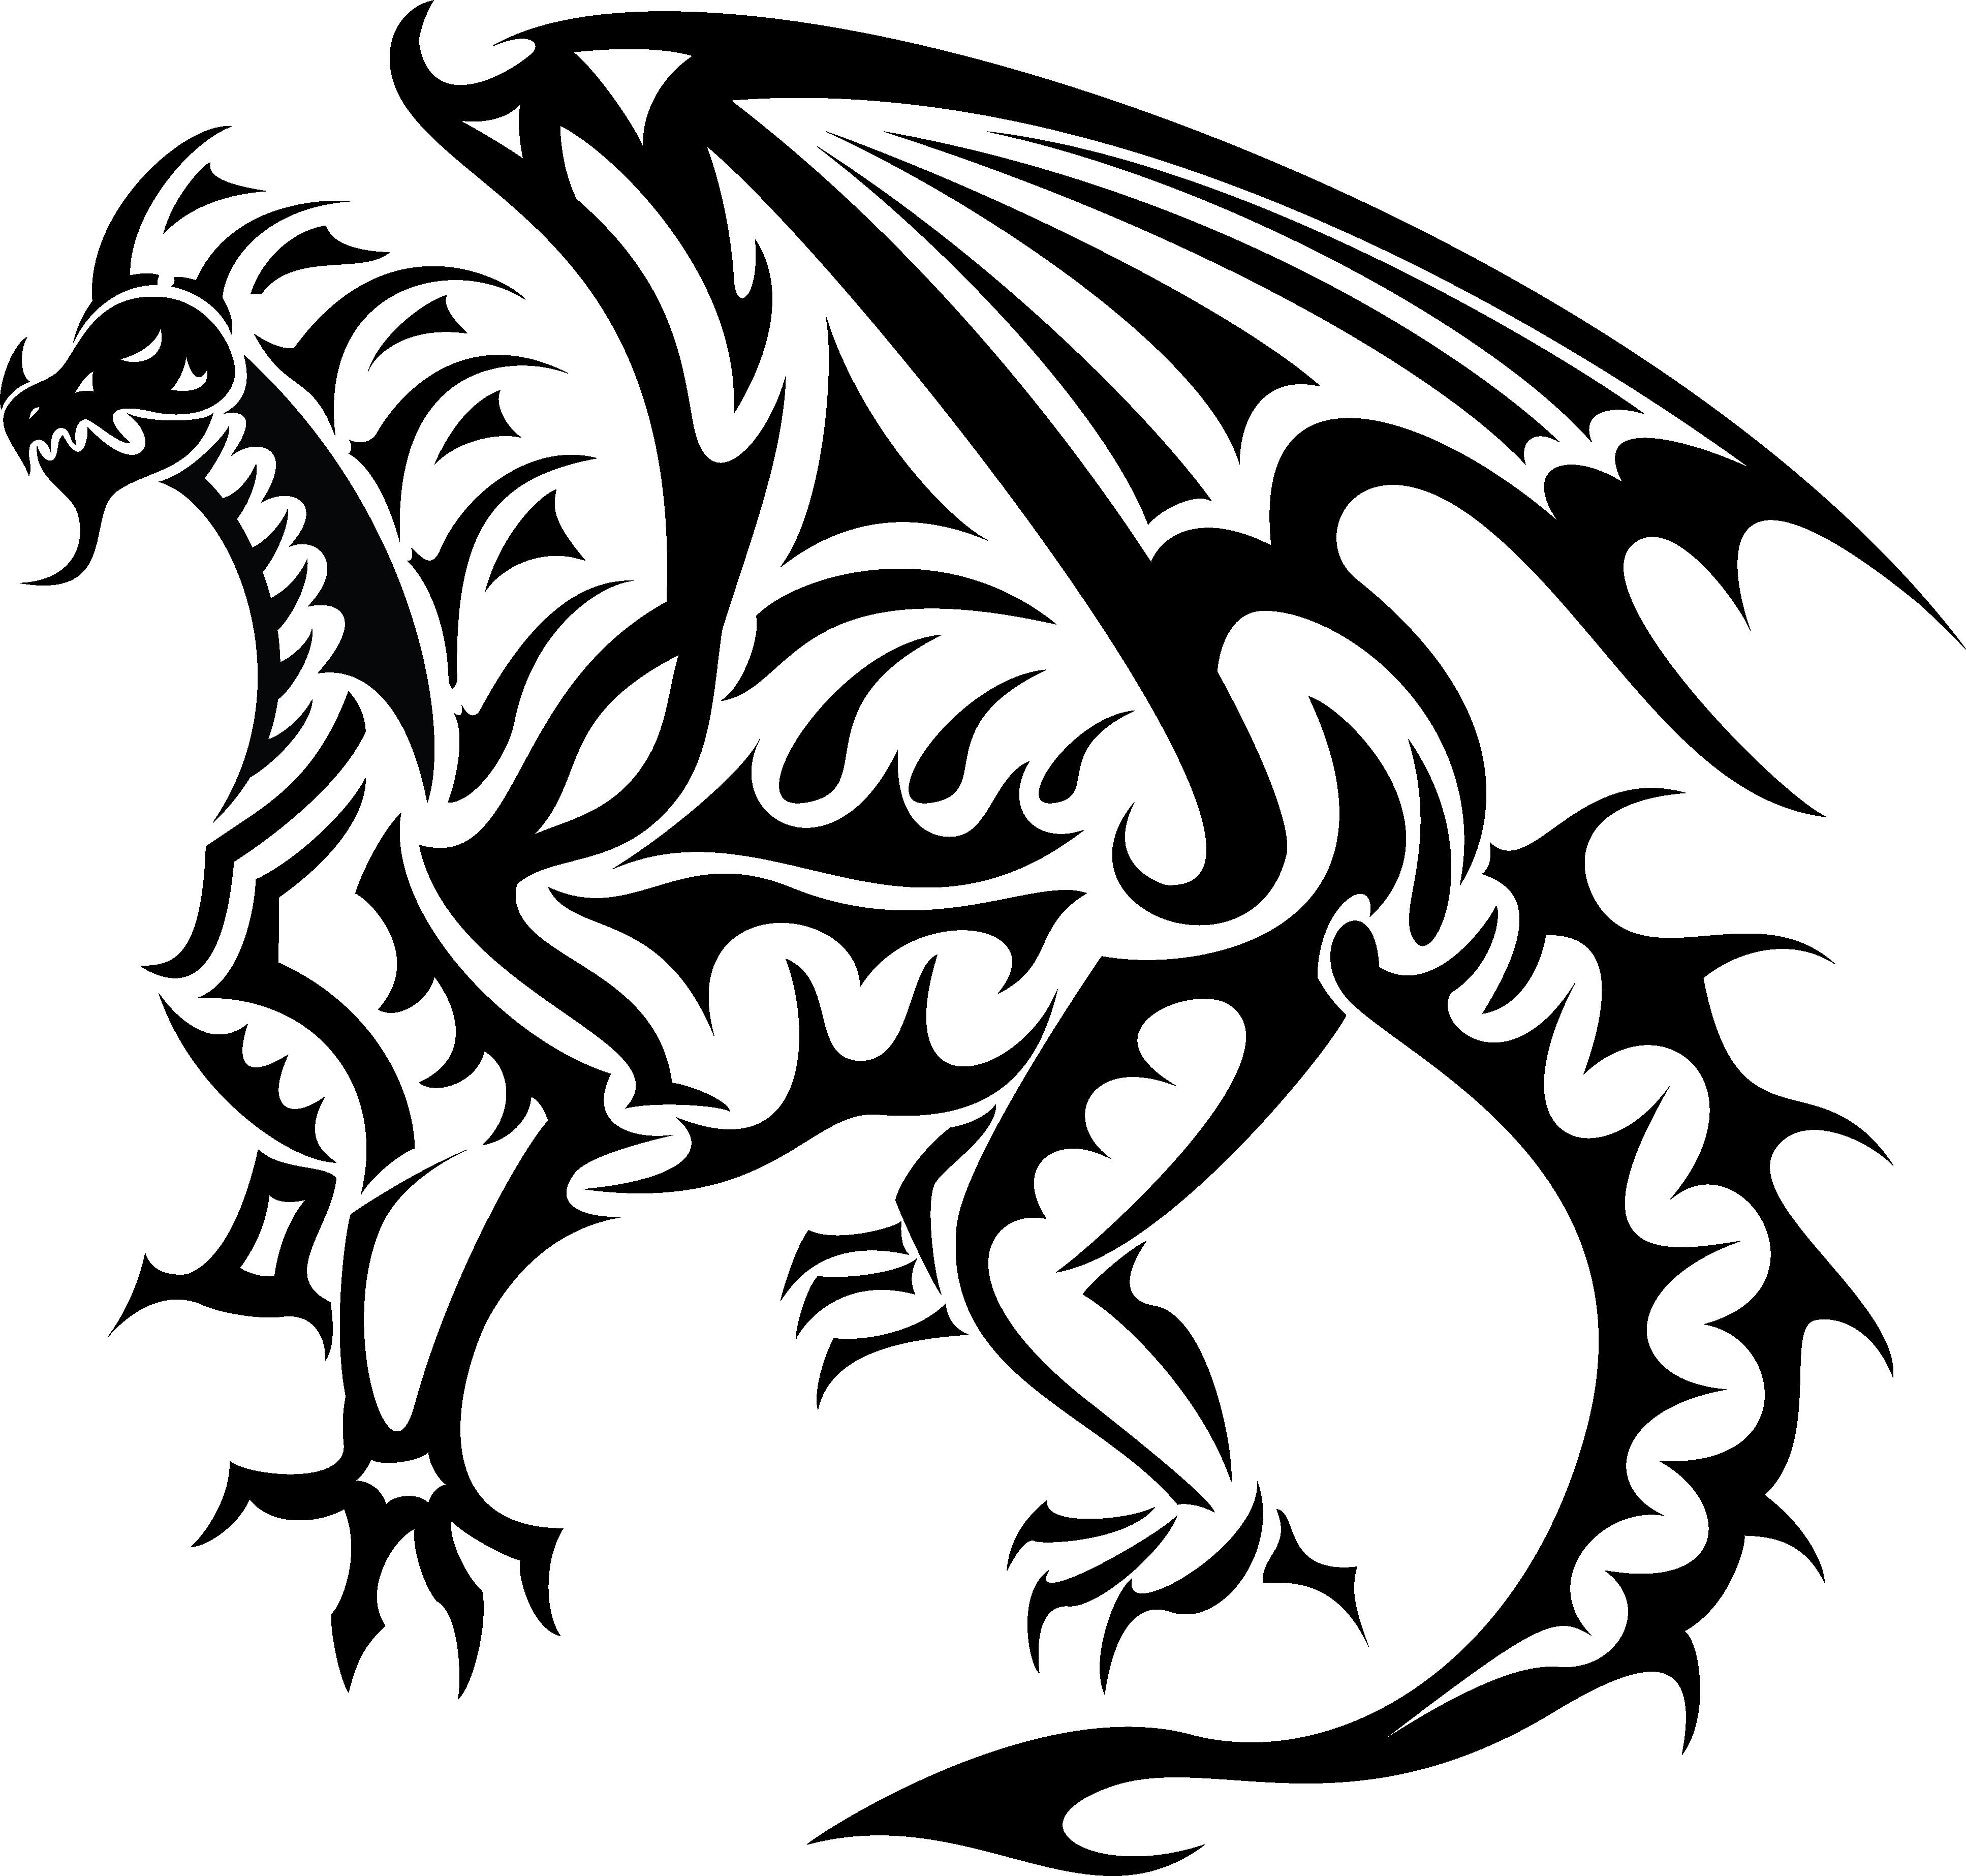 Free Dragon Transparent Png, Download Free Clip Art, Free Clip Art.